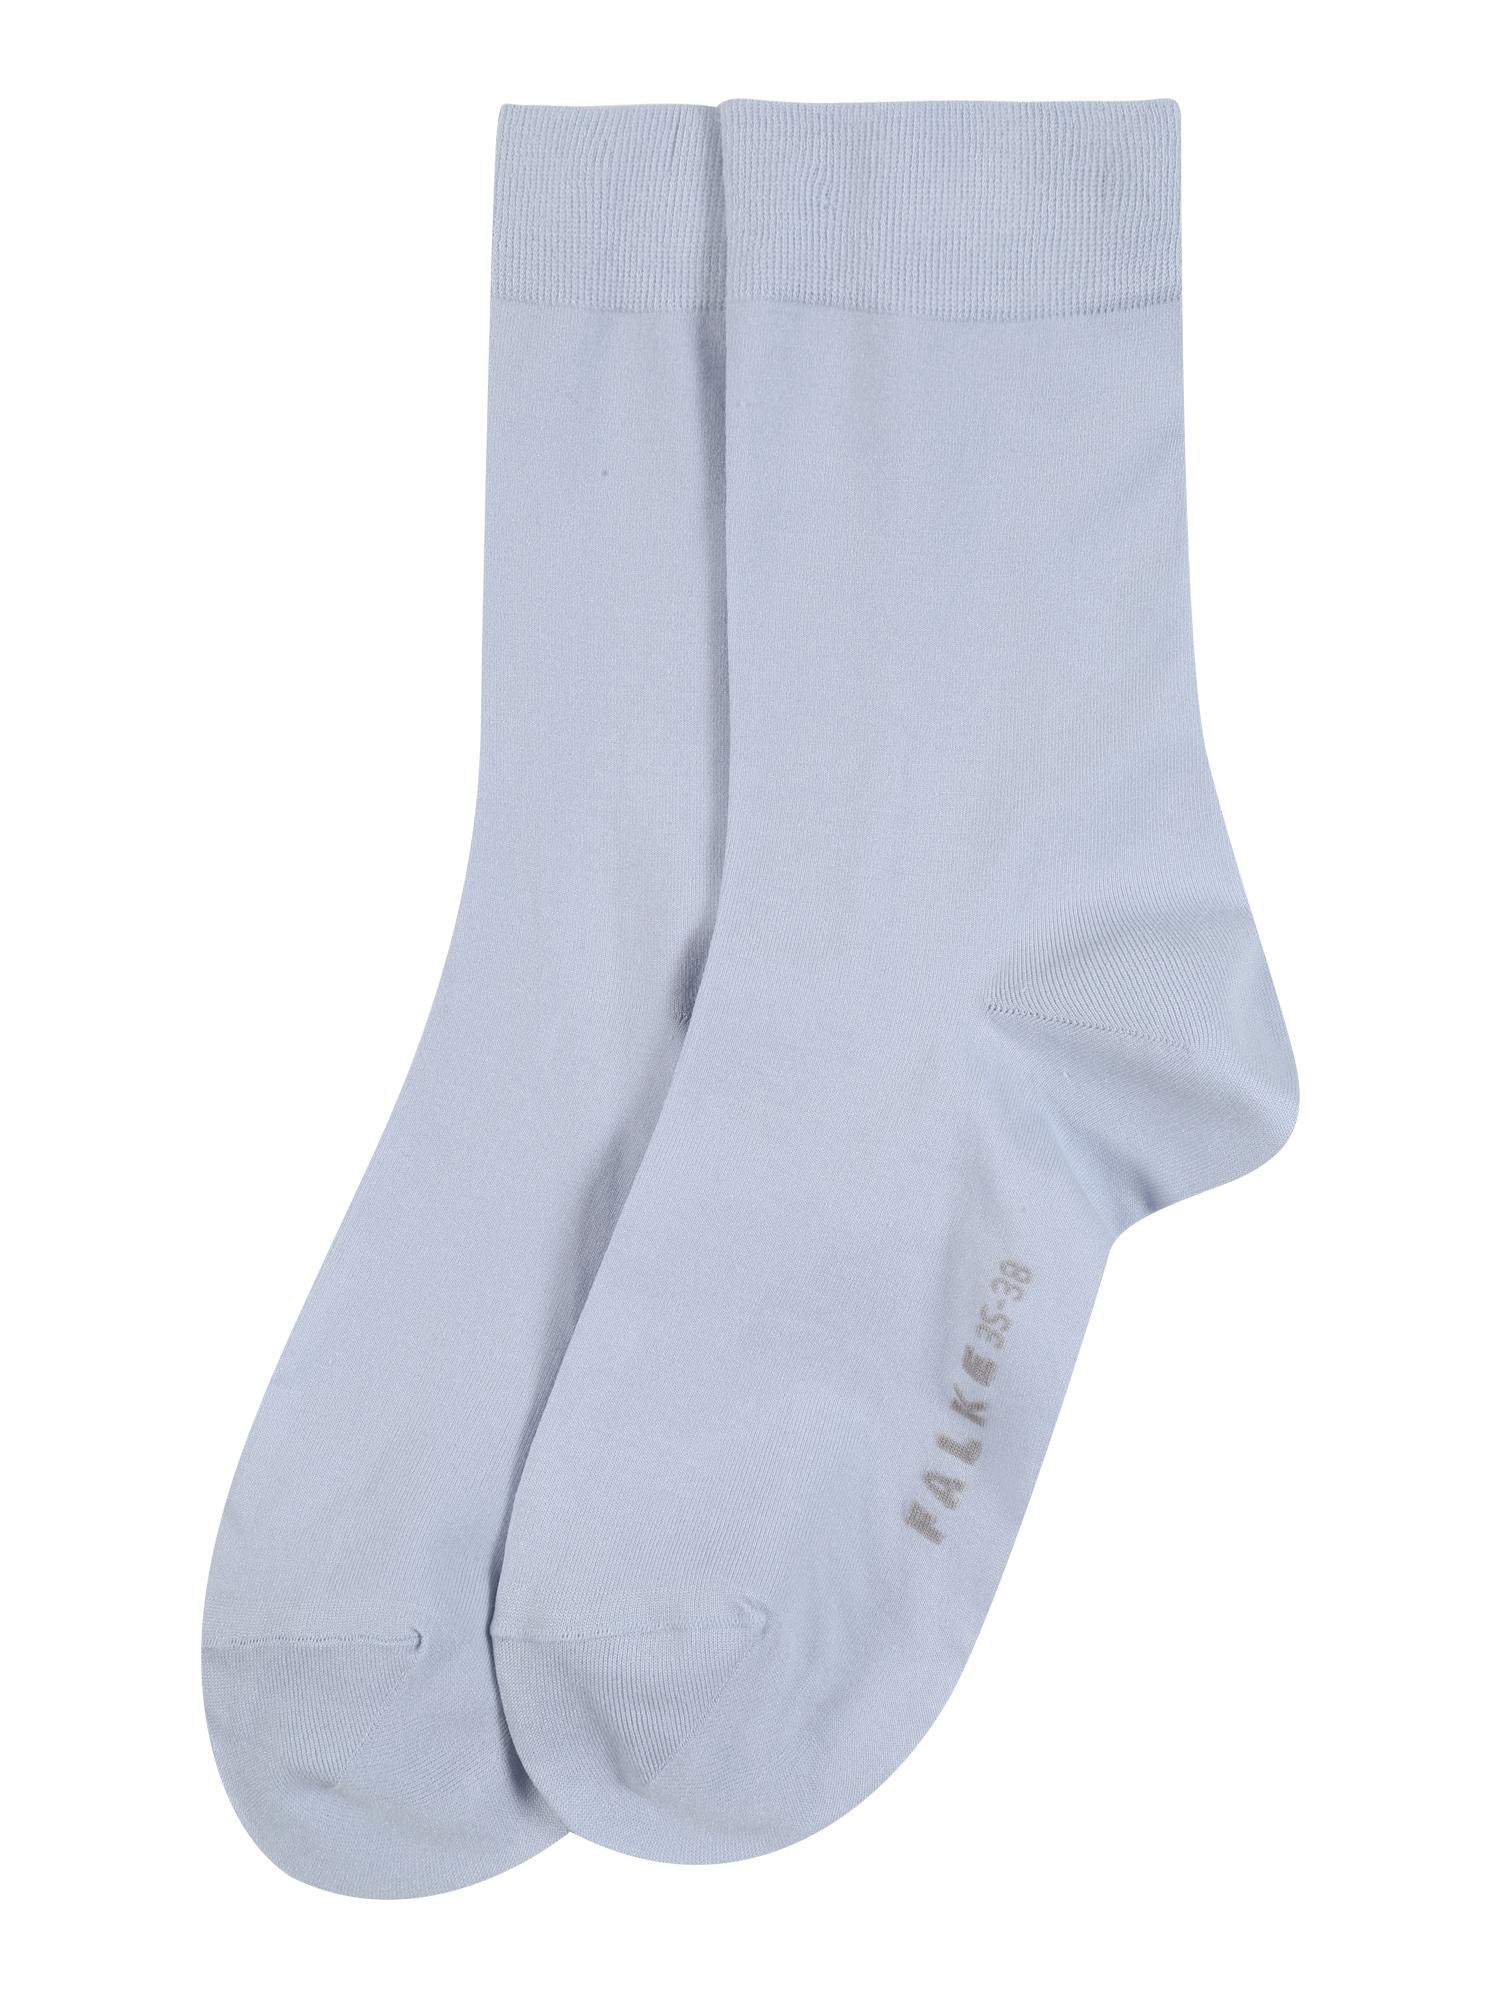 FALKE Kojinės 'Cotton Touch' mėlyna